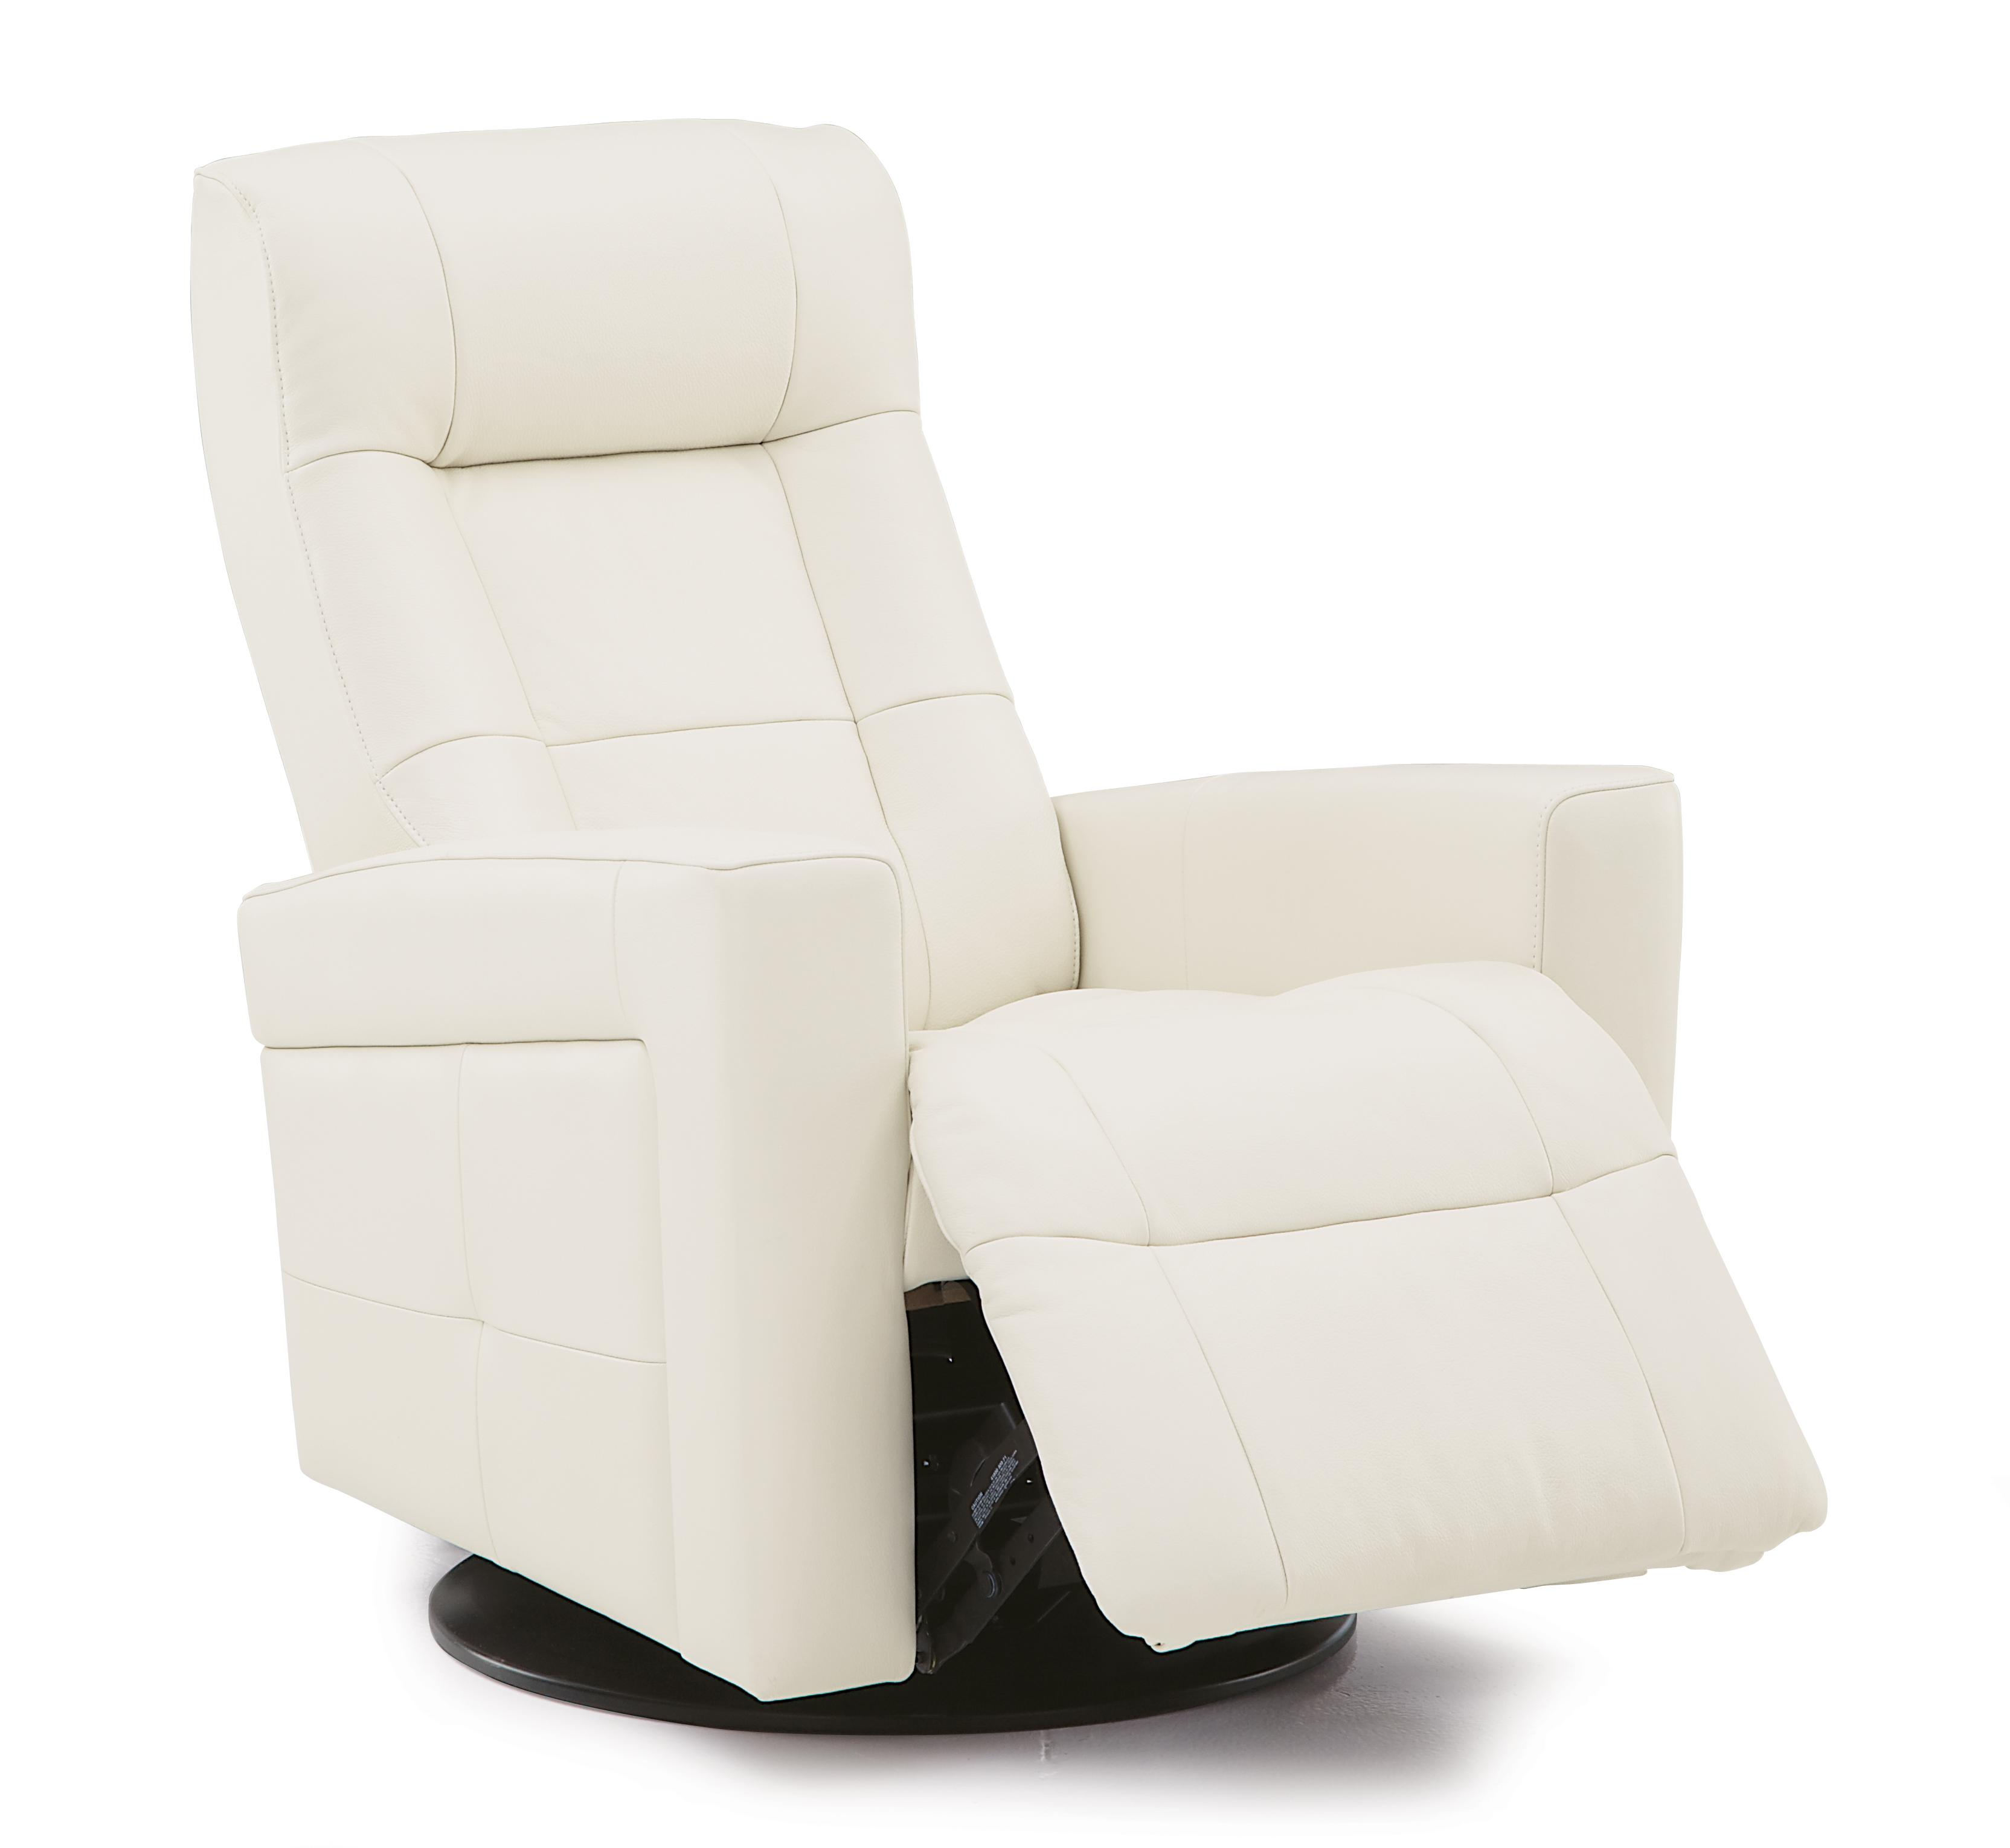 palliser chair and ottoman alite monarch canada chesapeake 43202 38 power swivel glider recliner